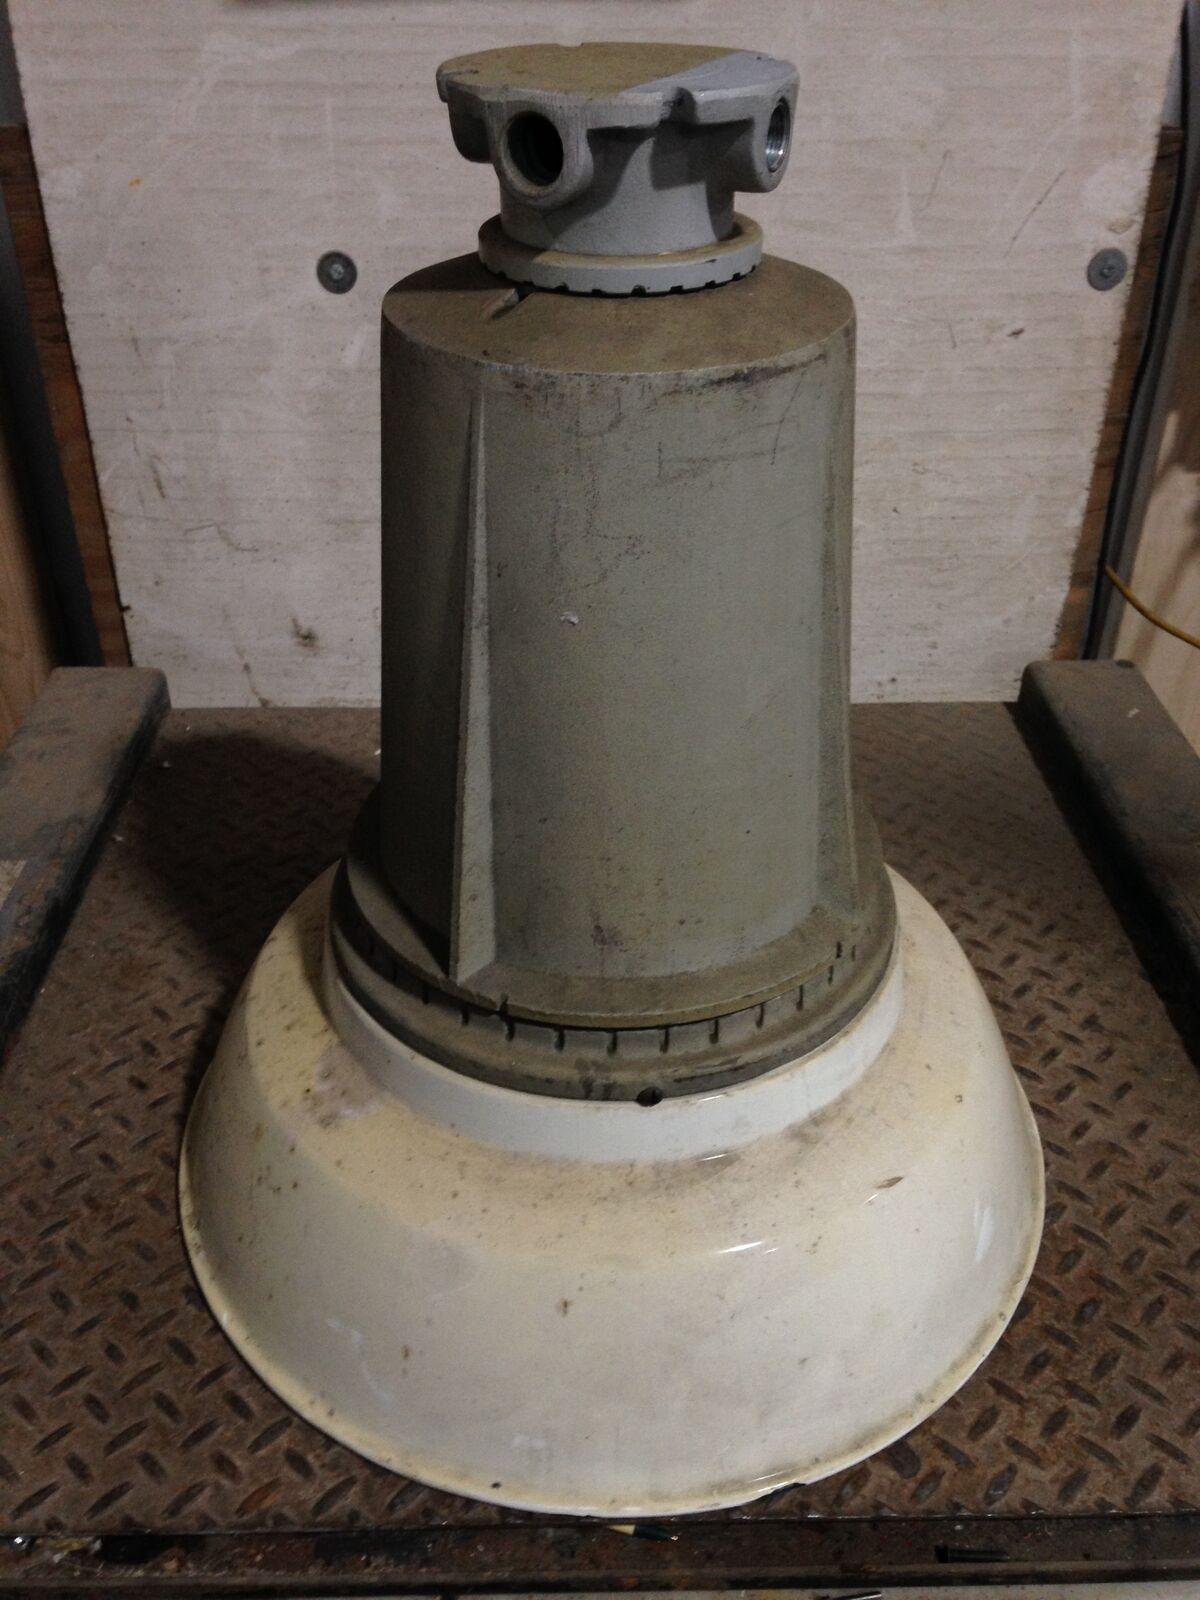 Appleton AMBH400-120 Explosion Explosion Explosion Proof Porcelain 20  Bay Light Fixture 120V 400W 0fefb6